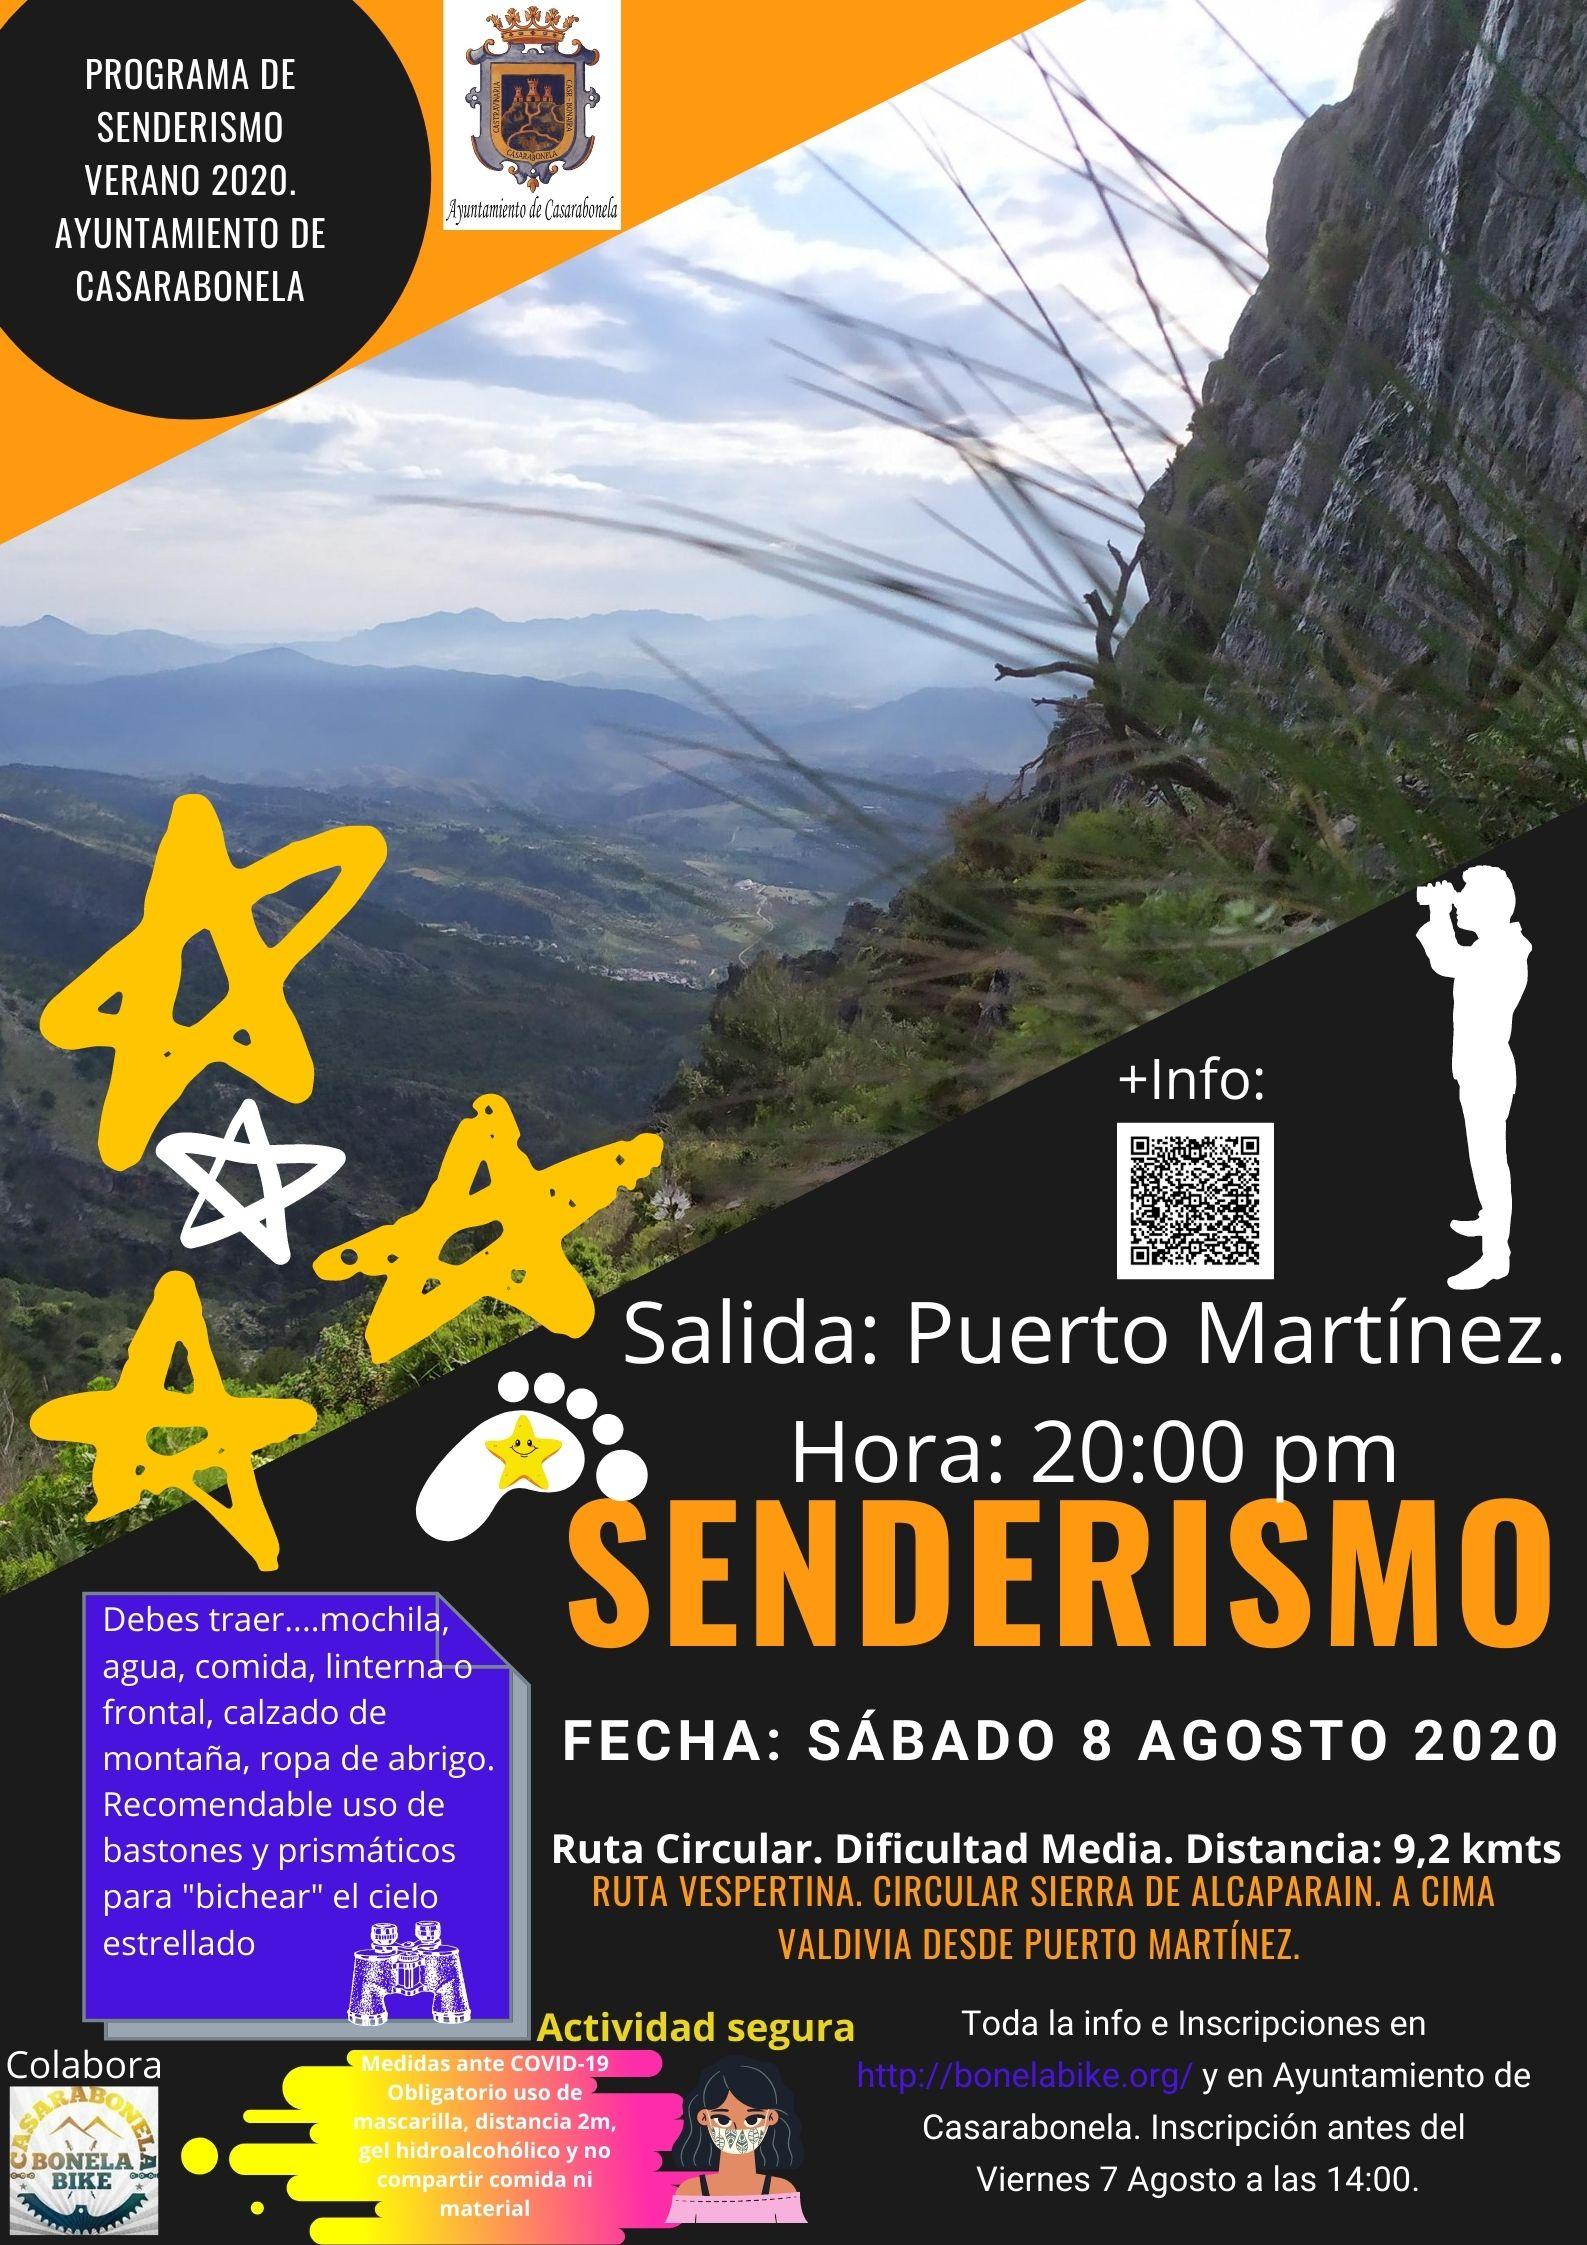 Ruta de Senderismo. Vespertina Circular Sierra de Alcaparain. A cima Valdivia desde Puerto Martínez. Fecha: Sábado 8 Agosto 2020.